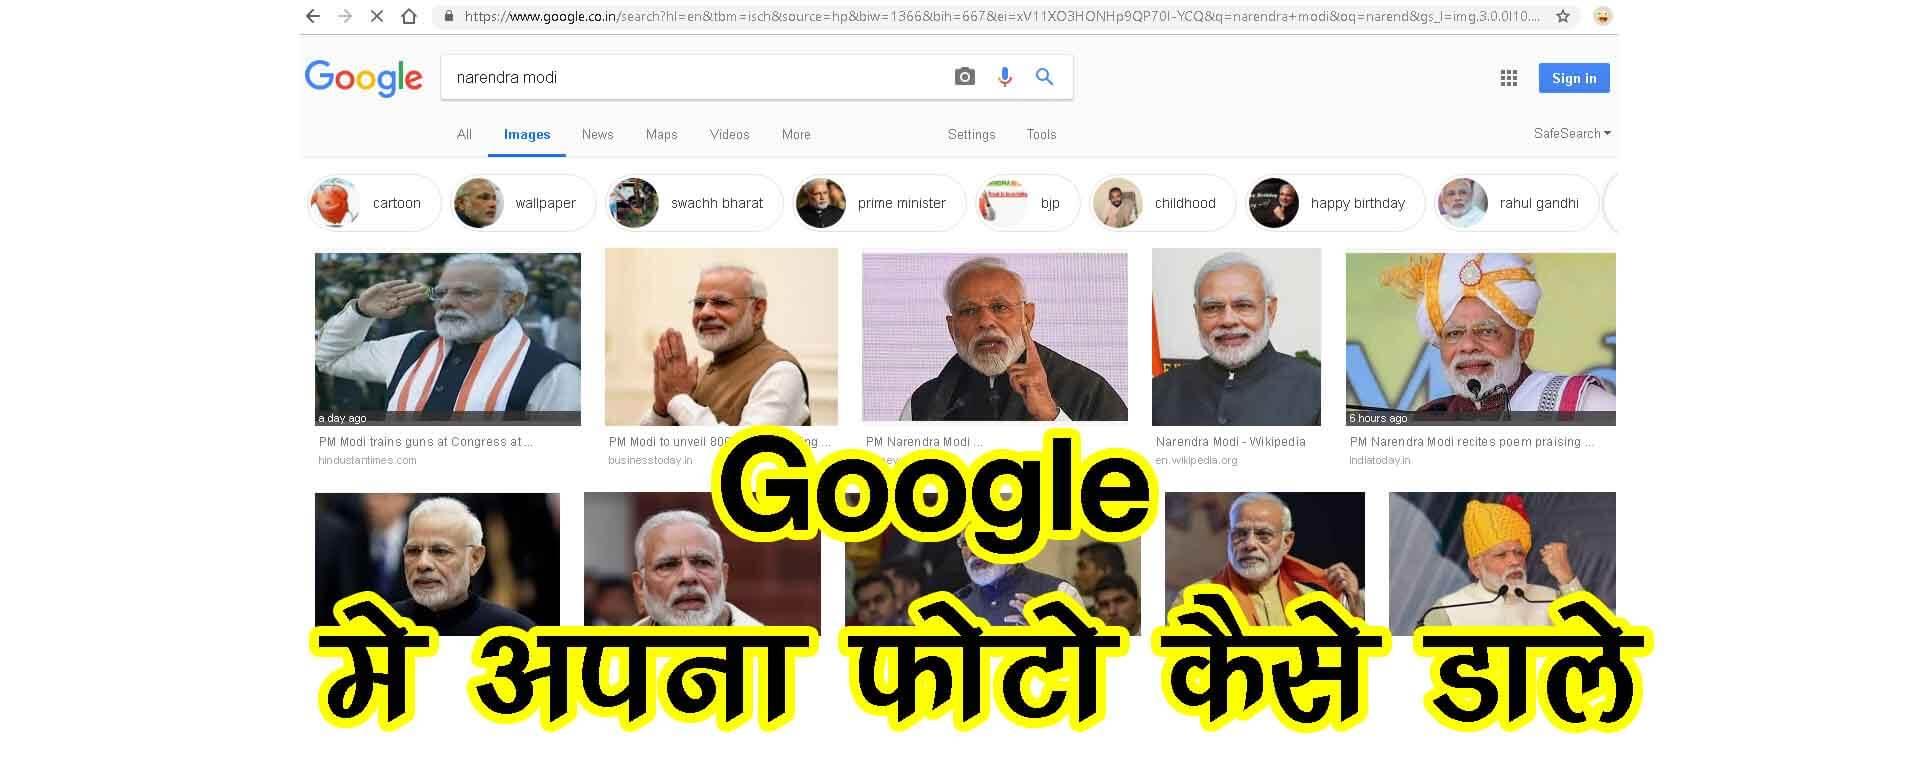 google me apna photo kaise dale